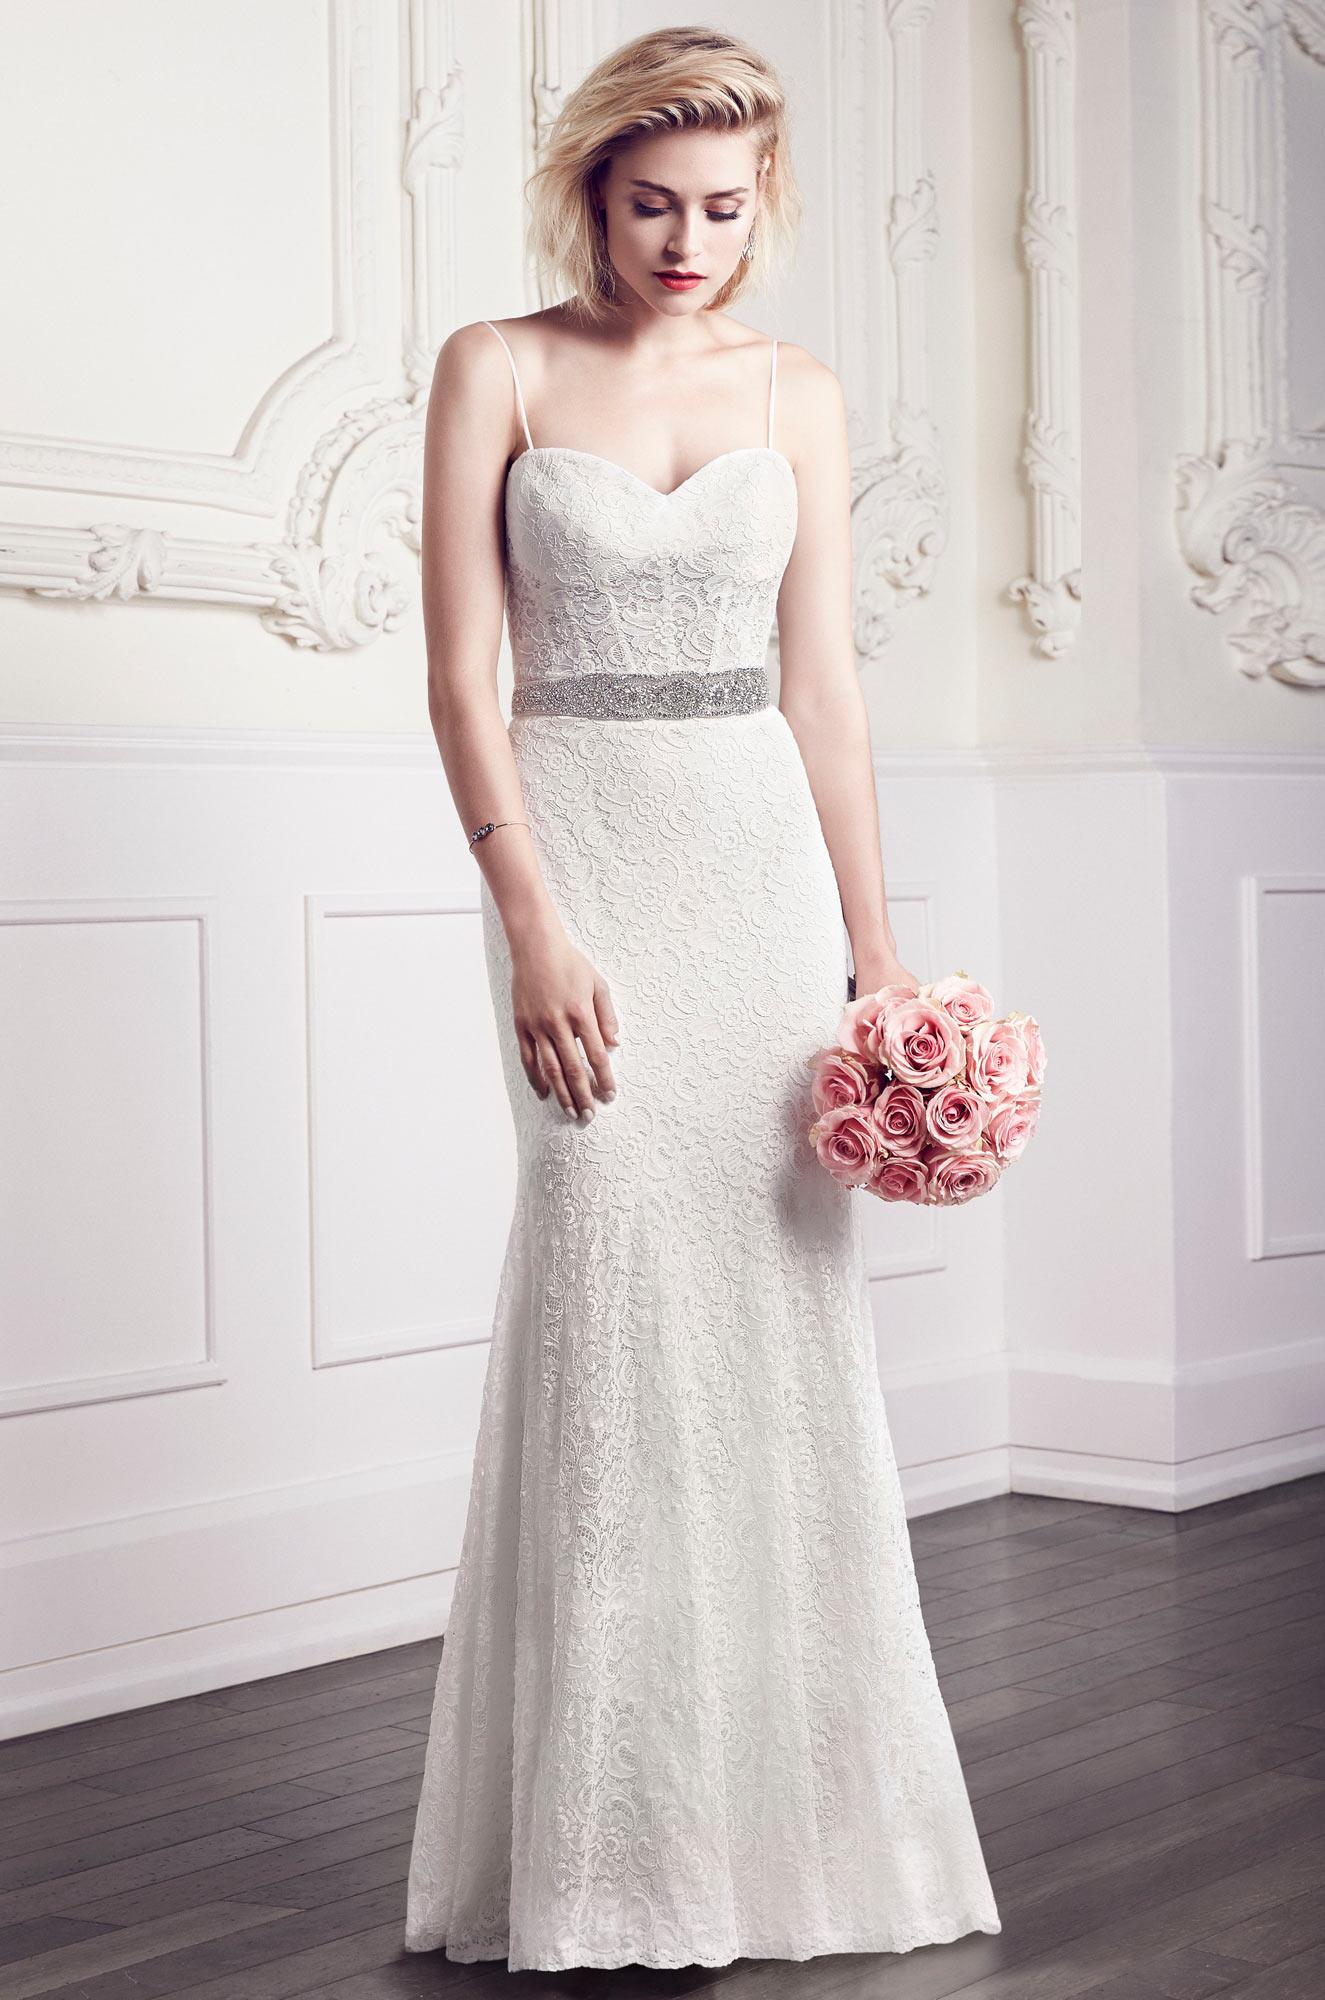 Corset Lace Wedding Dress Style 1952 Mikaella Bridal - Corset For Under Wedding Dress